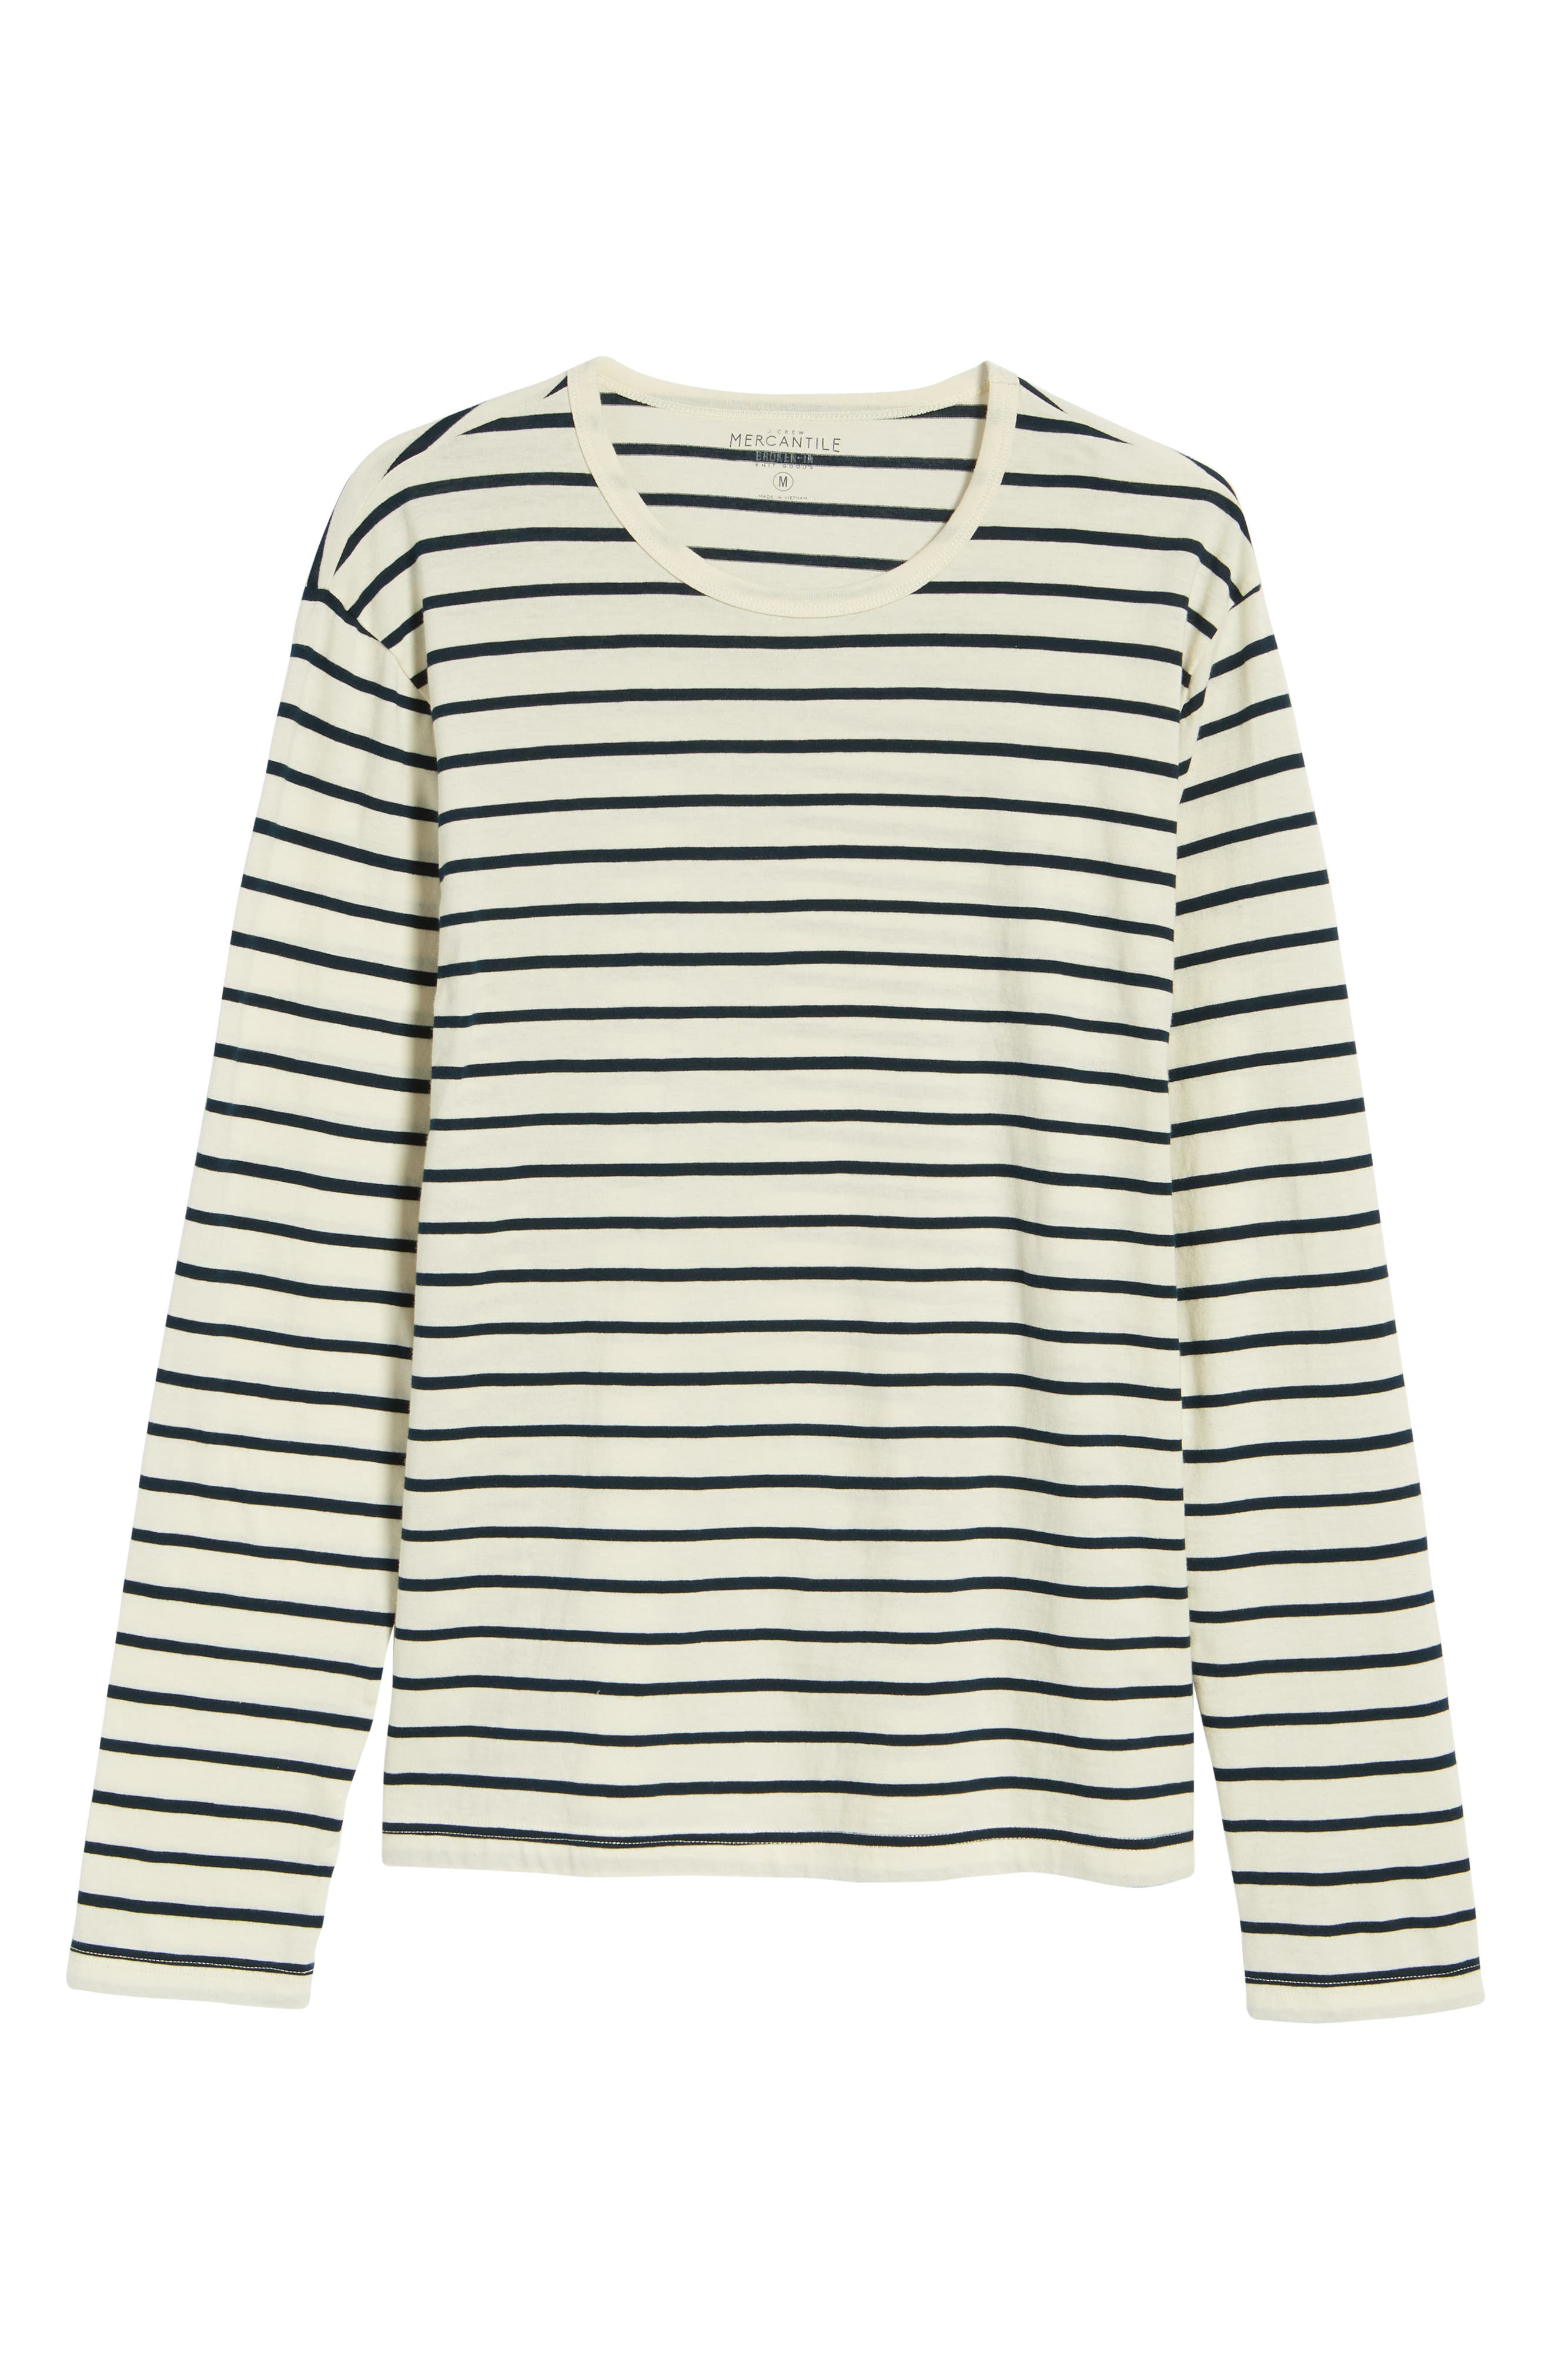 Mercantile Stripe Long Sleeve T-Shirt,                             Alternate thumbnail 6, color,                             Mountain White